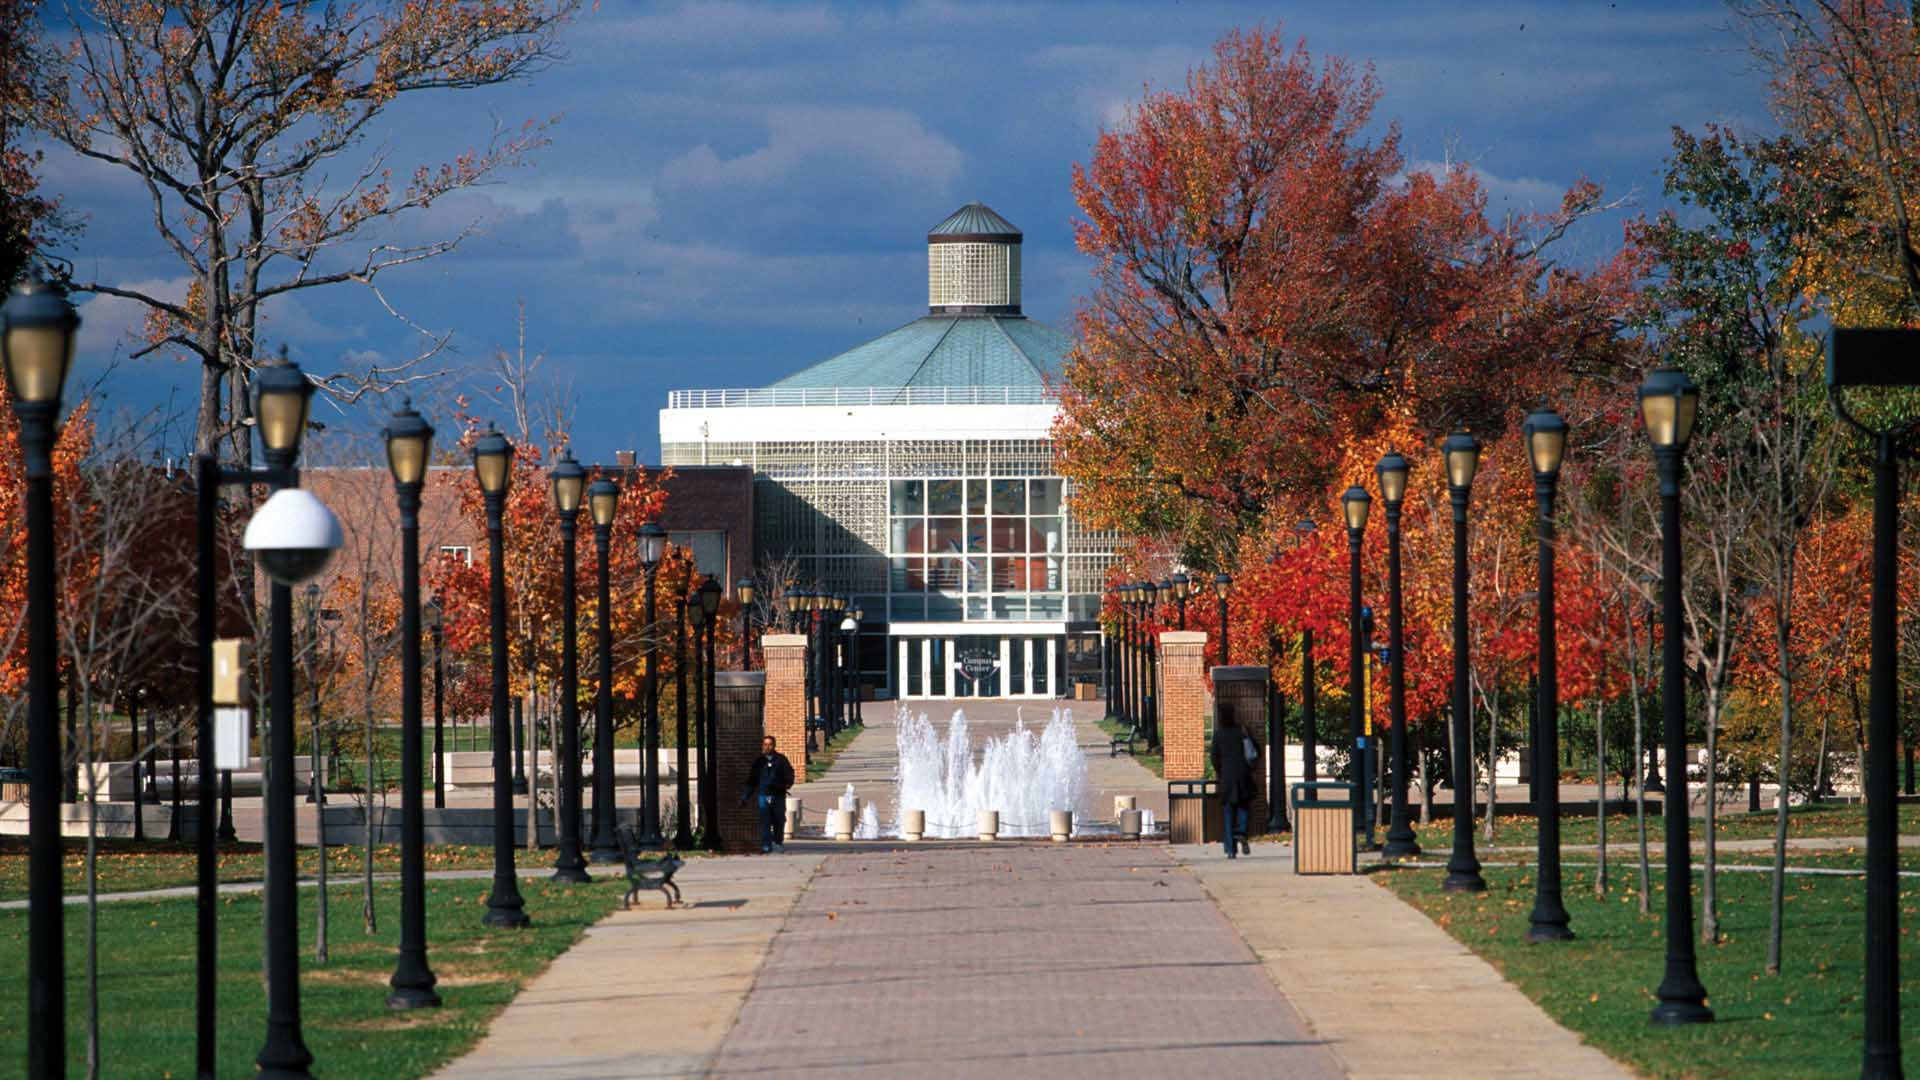 College Of Staten Island | Macaulay Honors College inside College Of Staten Island Starts In Fall